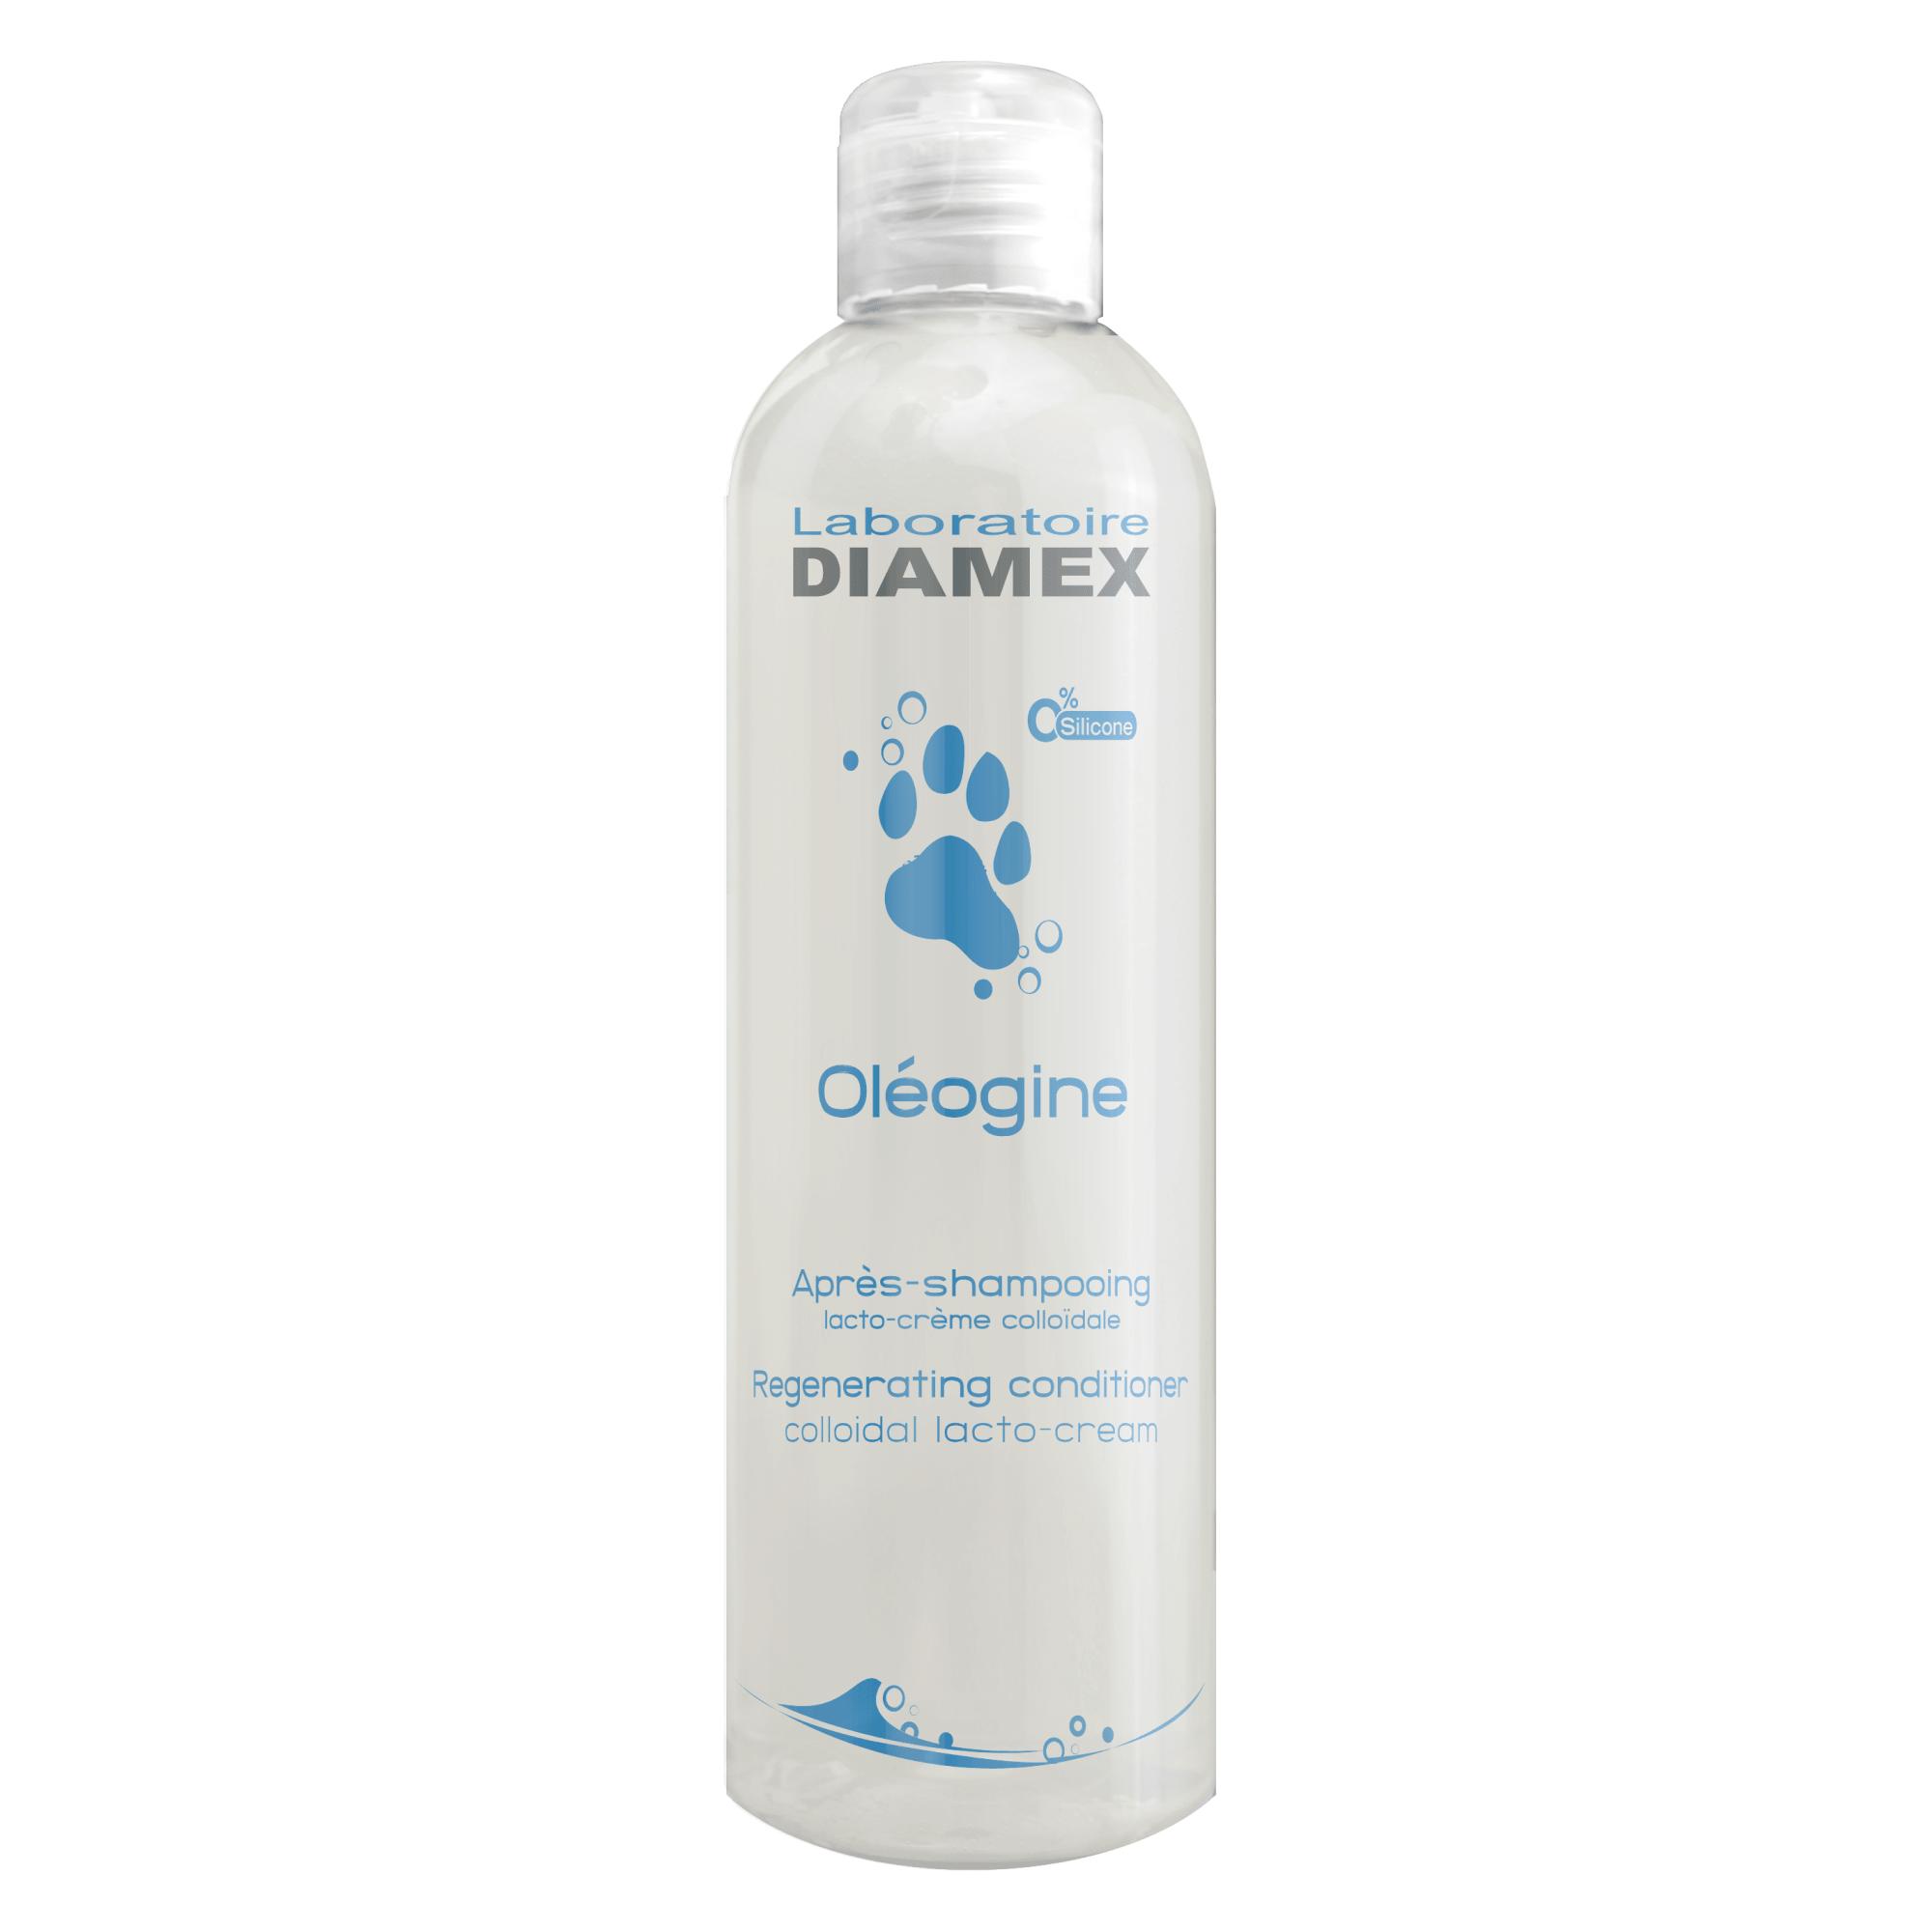 Après-shampooing Diamex Oléogine